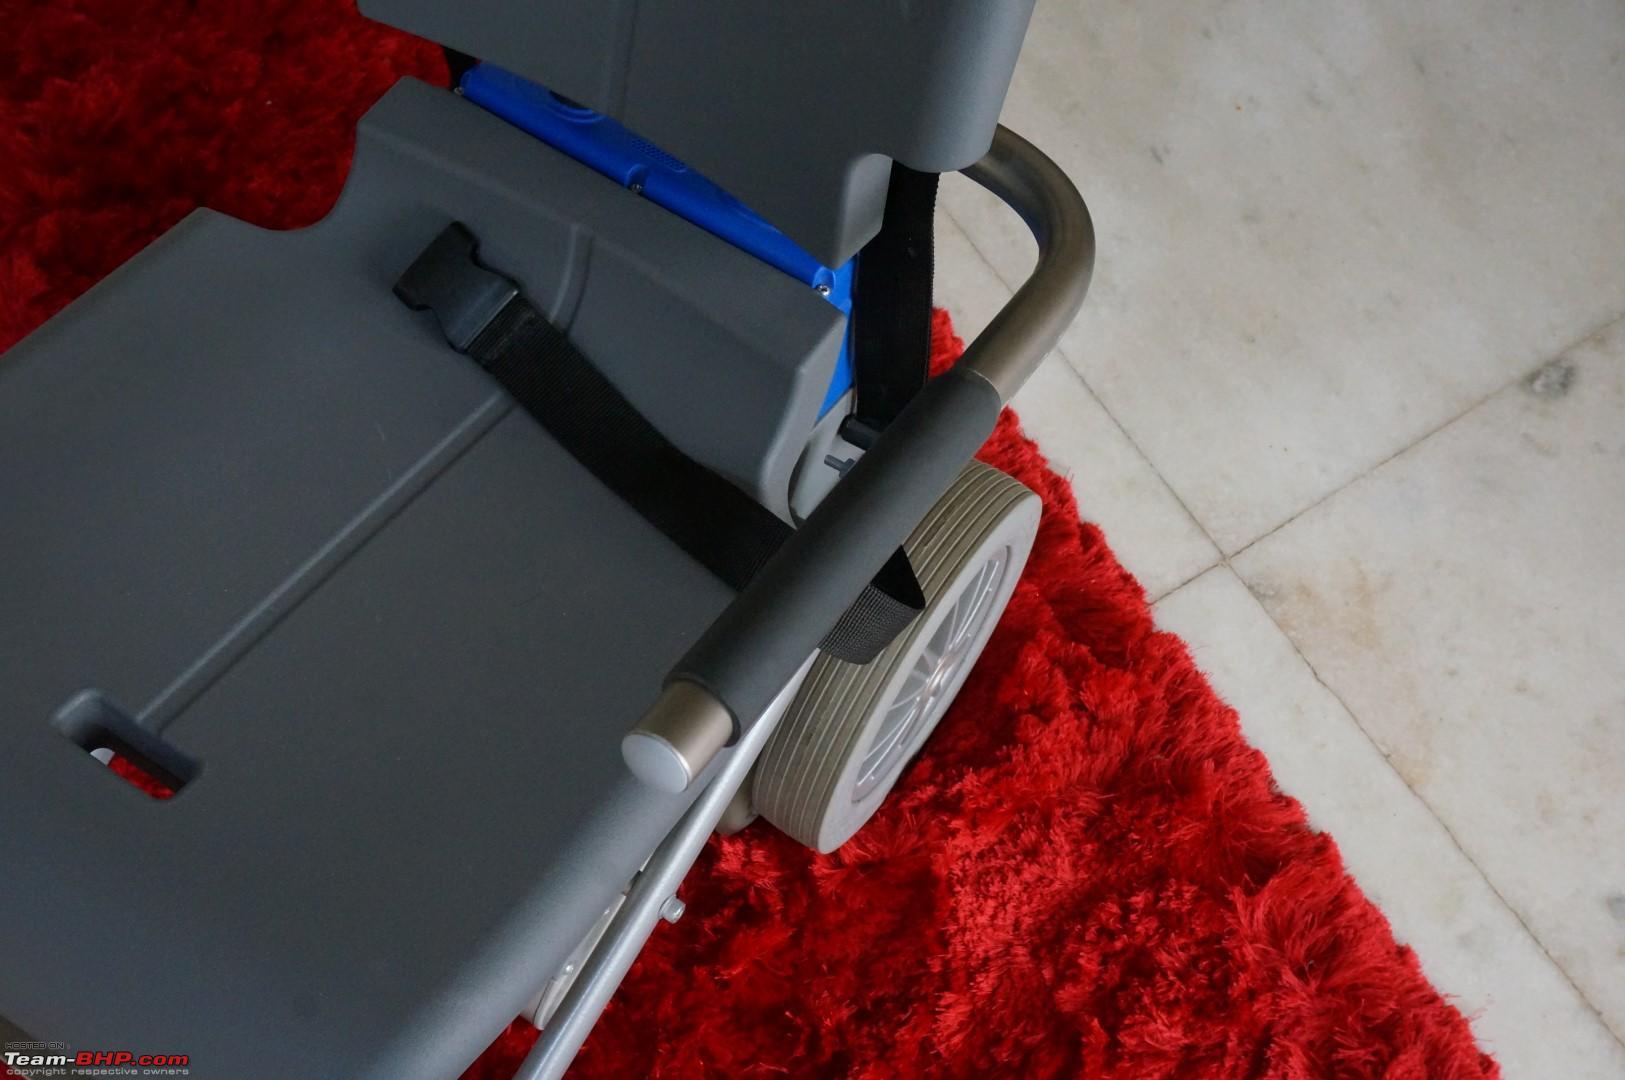 stair climbing chair with chrome steel legs team bhp senior citizen mobility